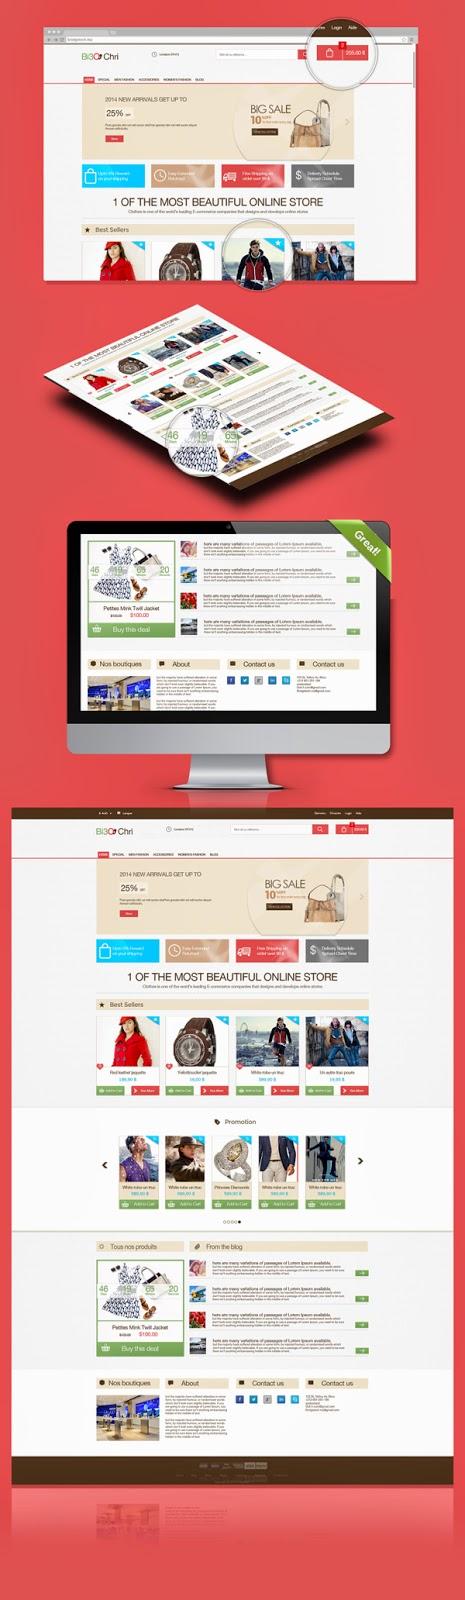 Free E-commerce PSD Template